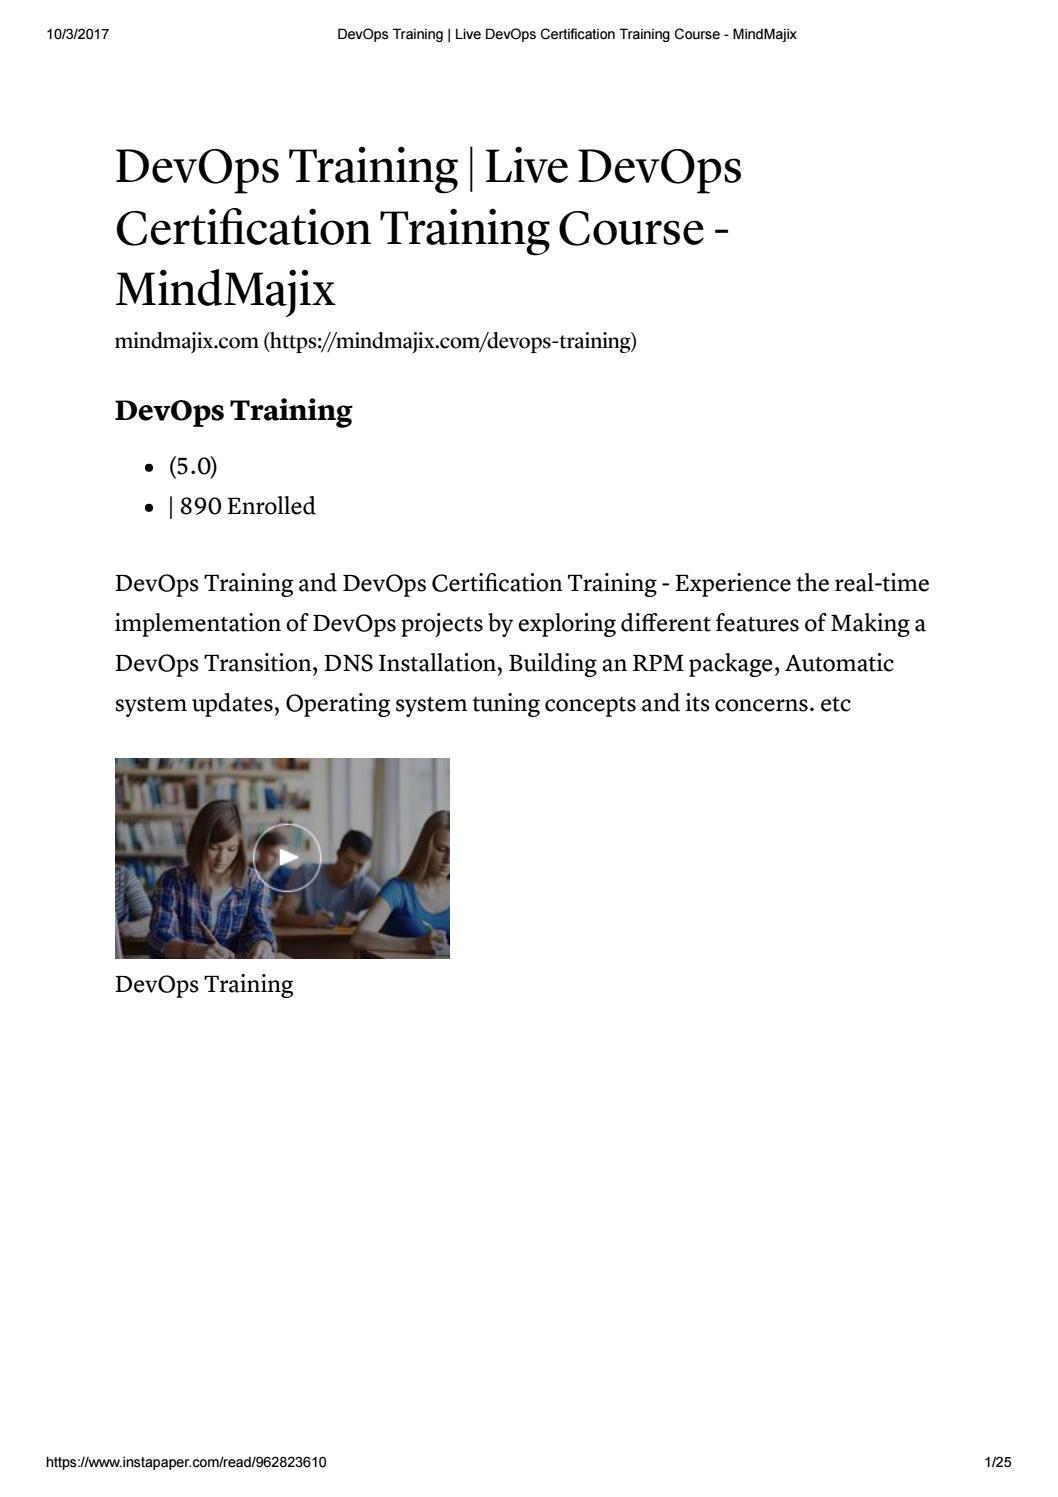 Devops Training Live Devops Certification Training Course Mindmajix